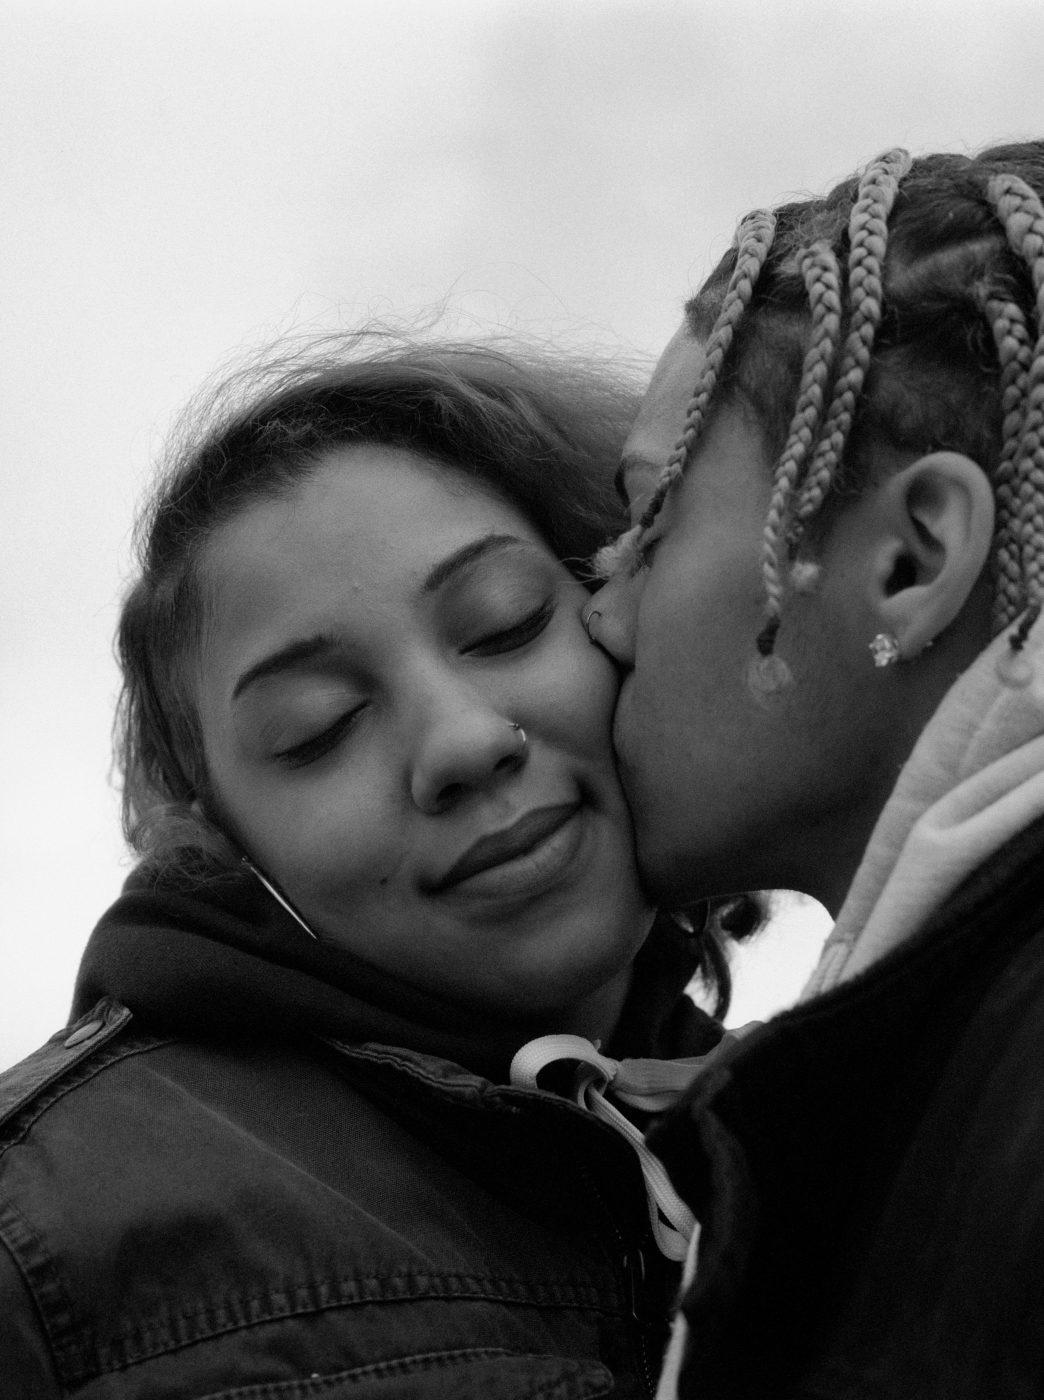 Lovers Kiss by AL J Thompson